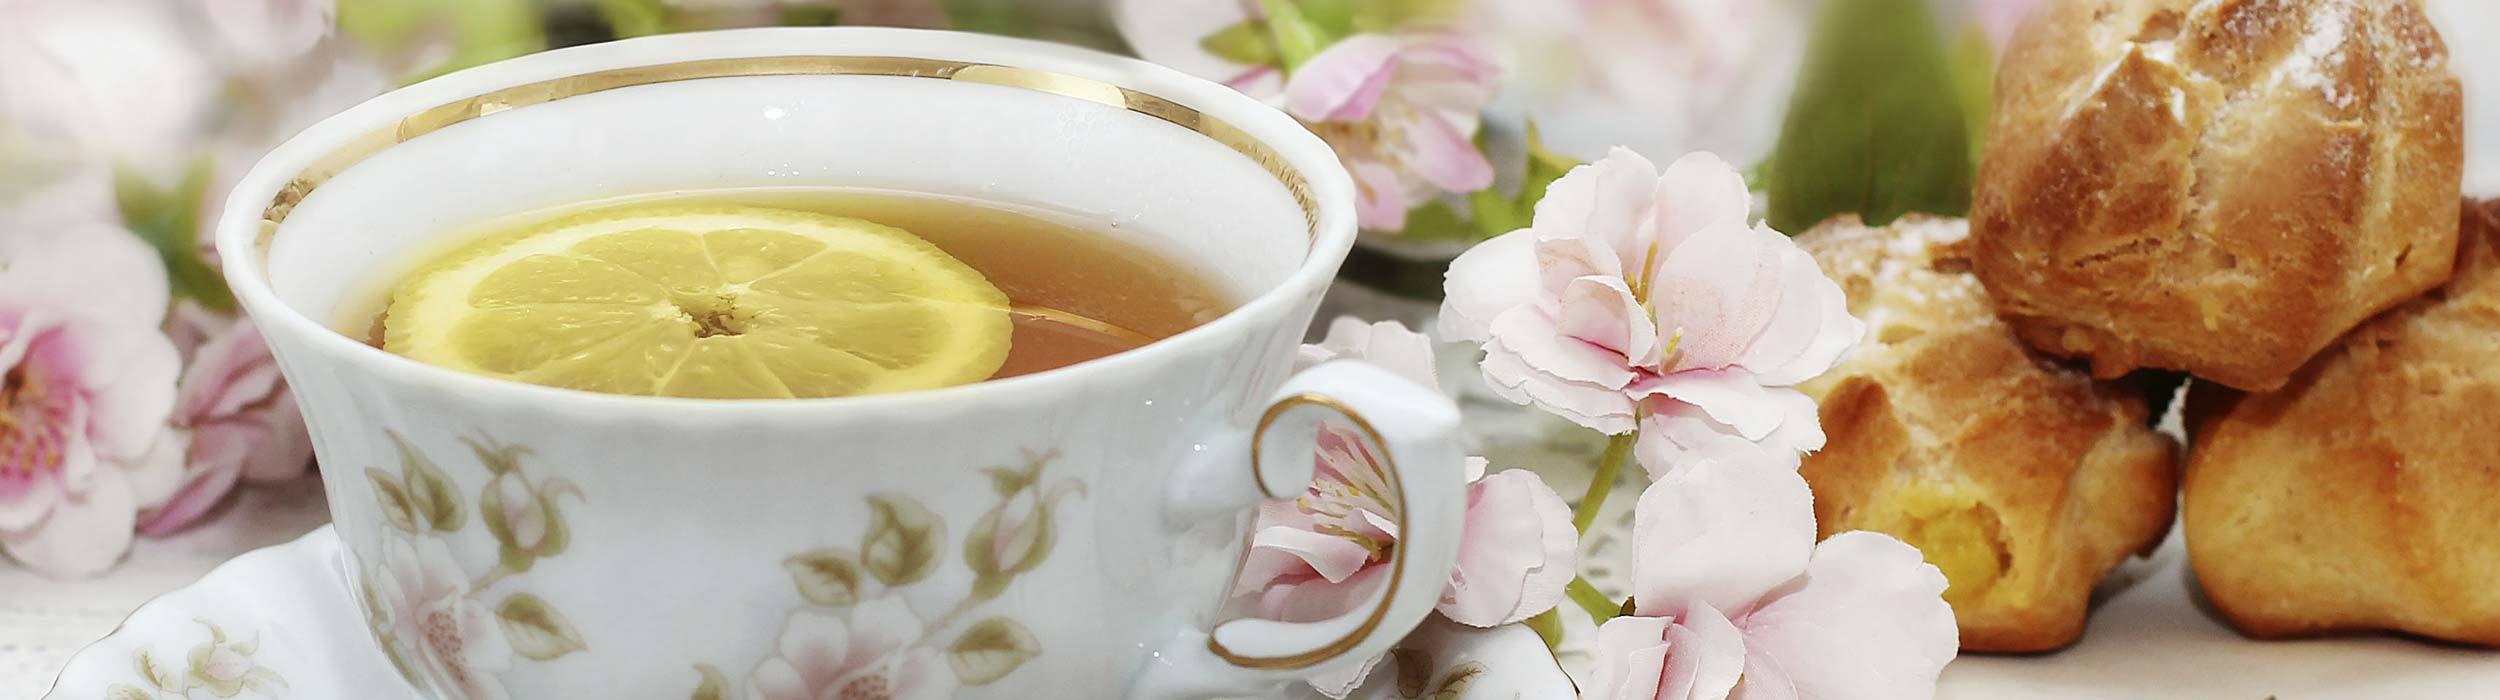 Afternoon tea with lemon